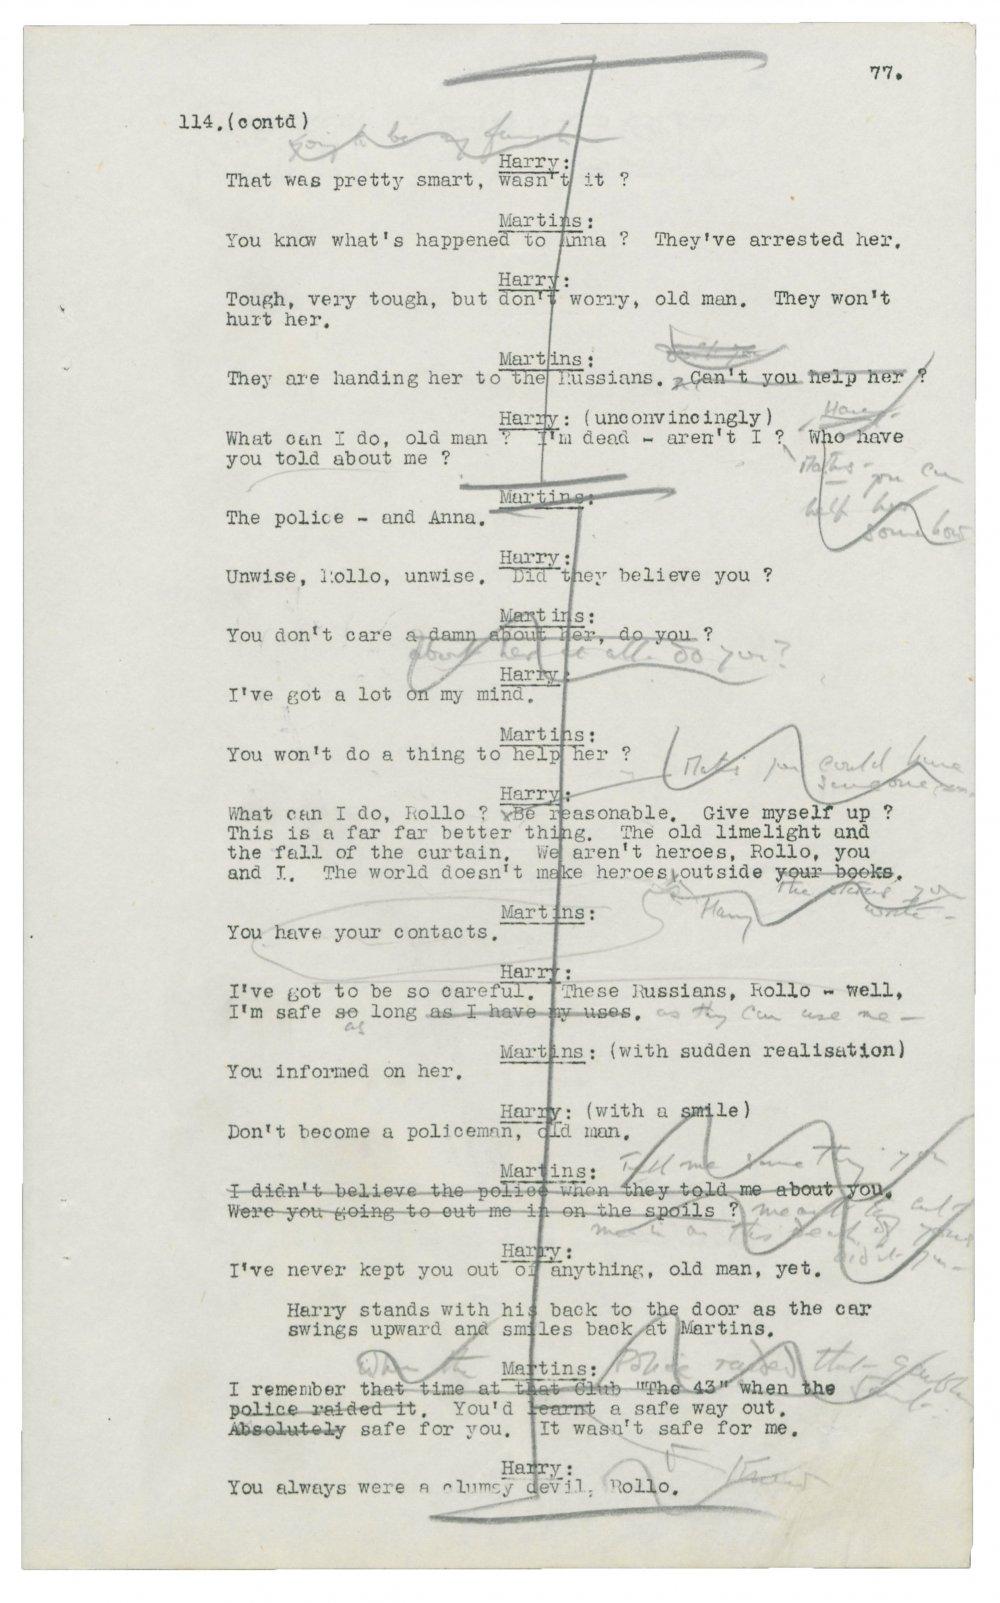 The Third Man (1949) script page